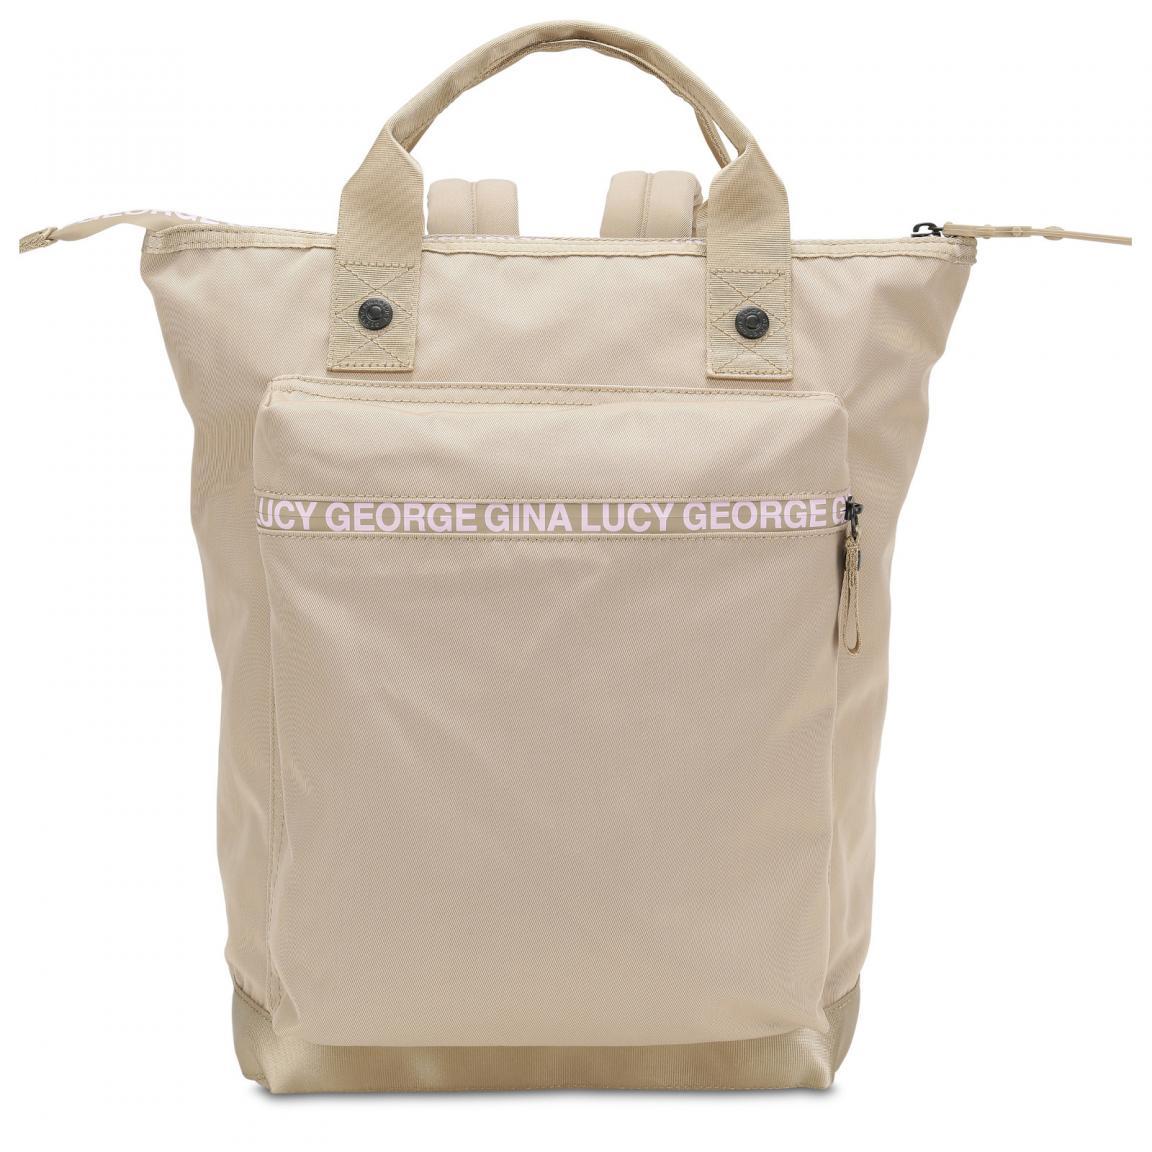 George Gina Lucy Alltagsrucksack The Monokissed beige rose